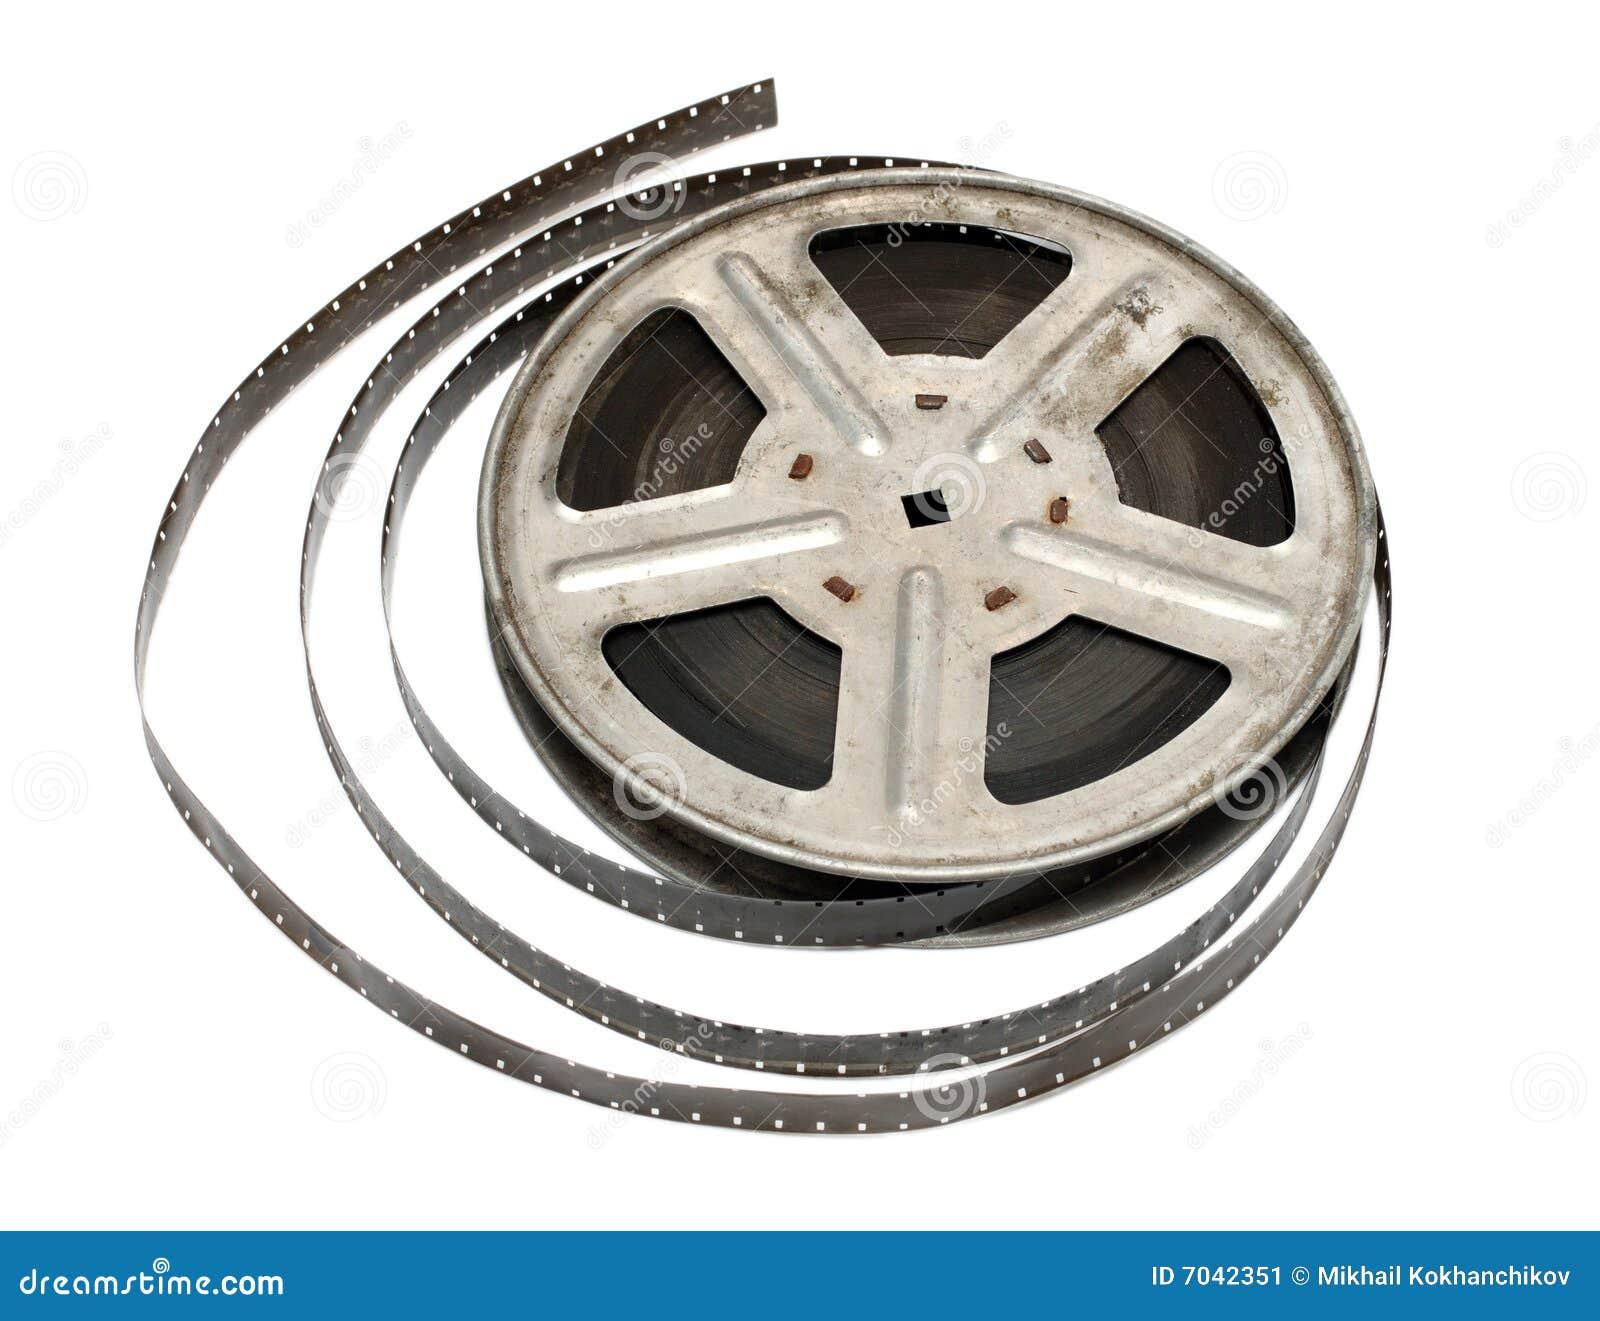 Old movie film on metal reel isolated on white